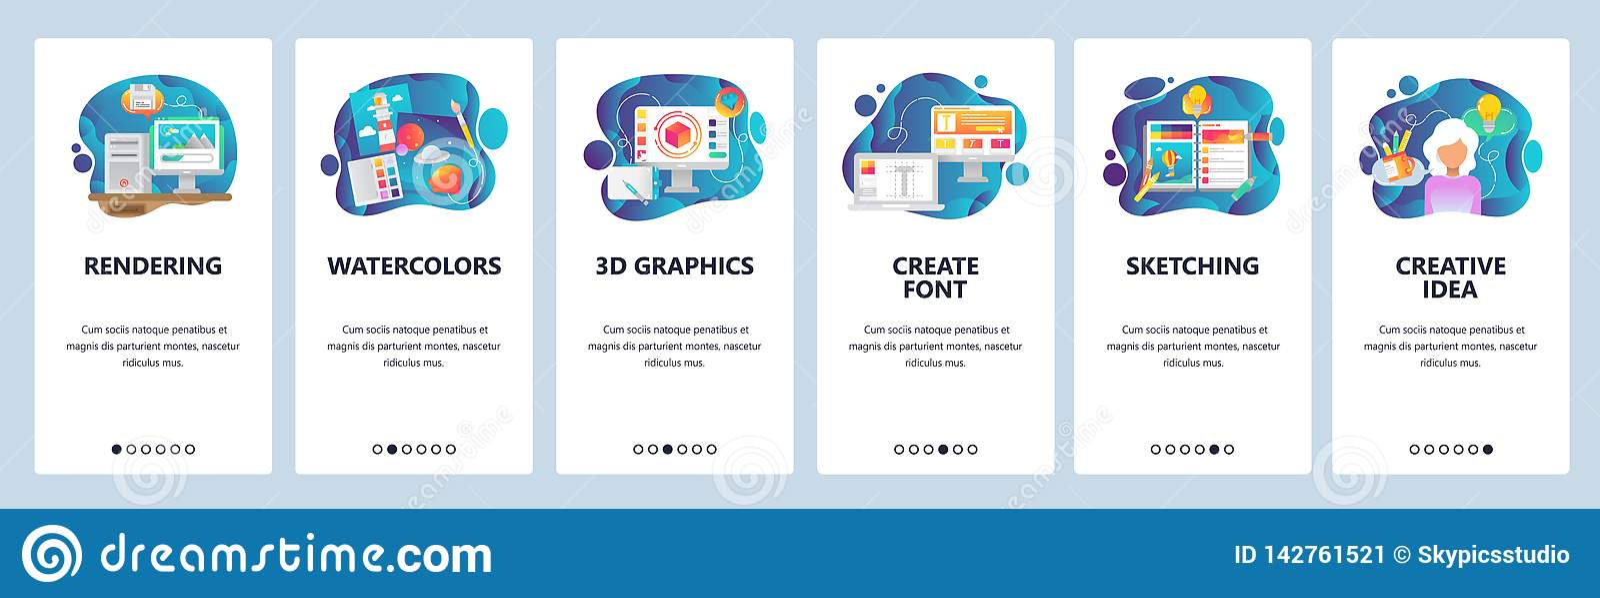 Mobile app onboarding screens. Digital art and watercolor painting, 3d rendering, sketching, font. Menu vector banner